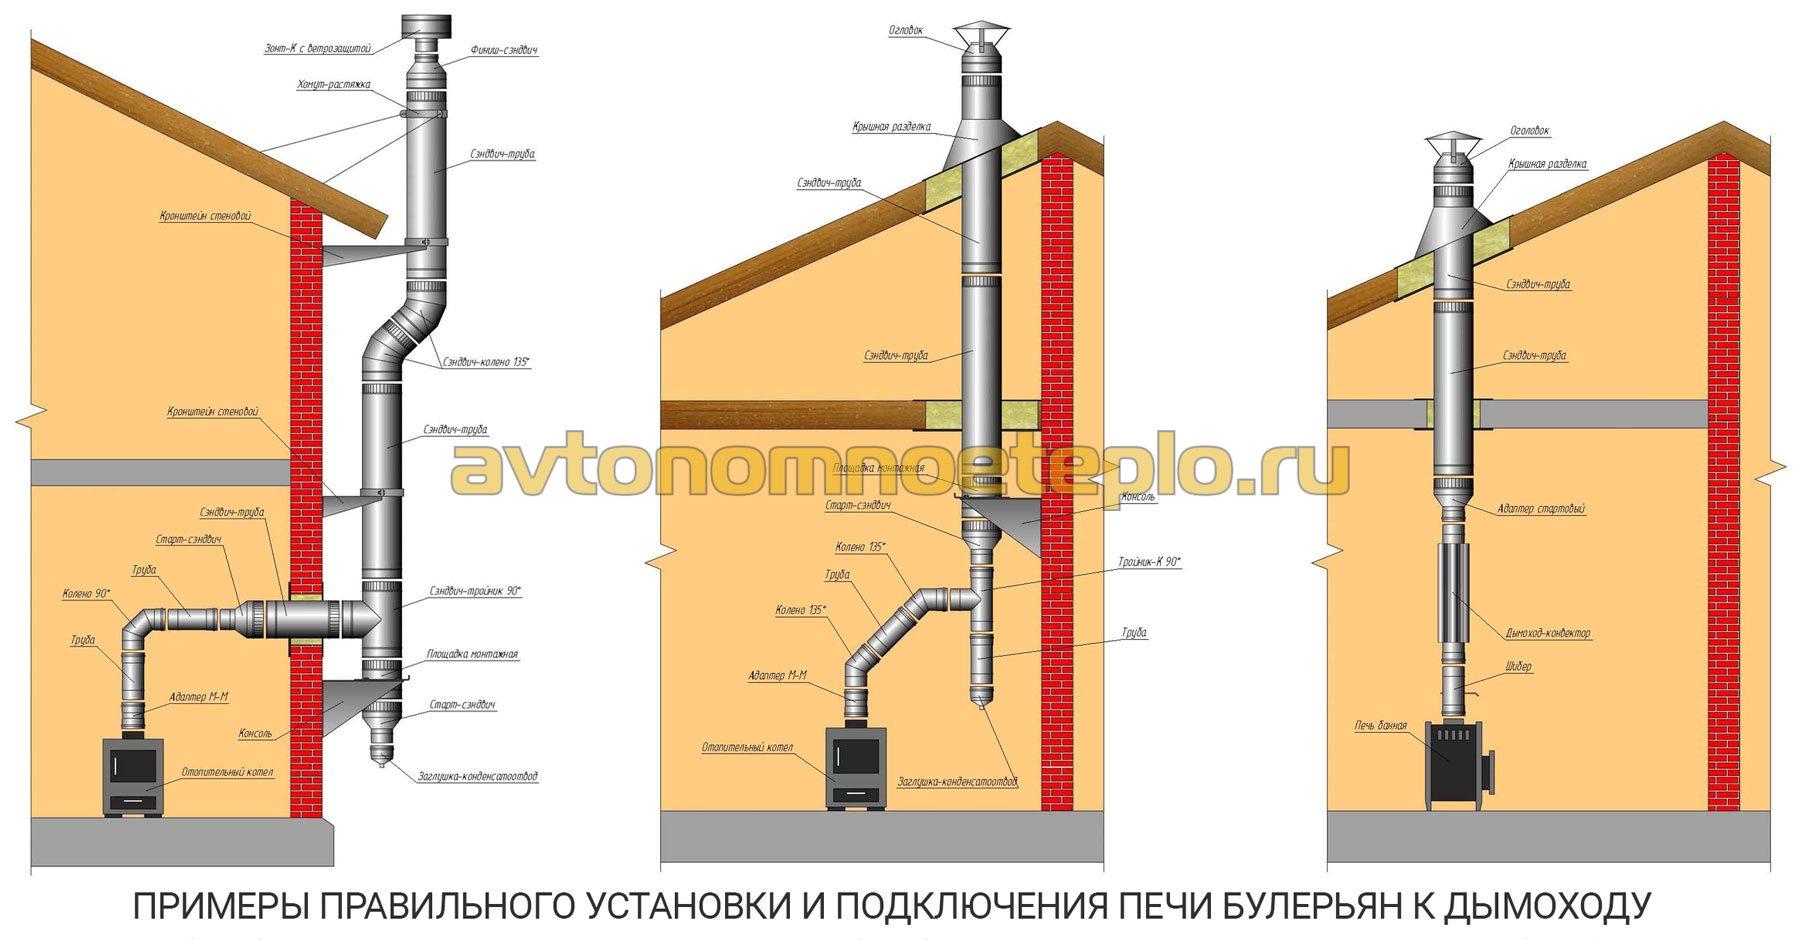 Как крепить трубу дымохода к печке как строит дымоход